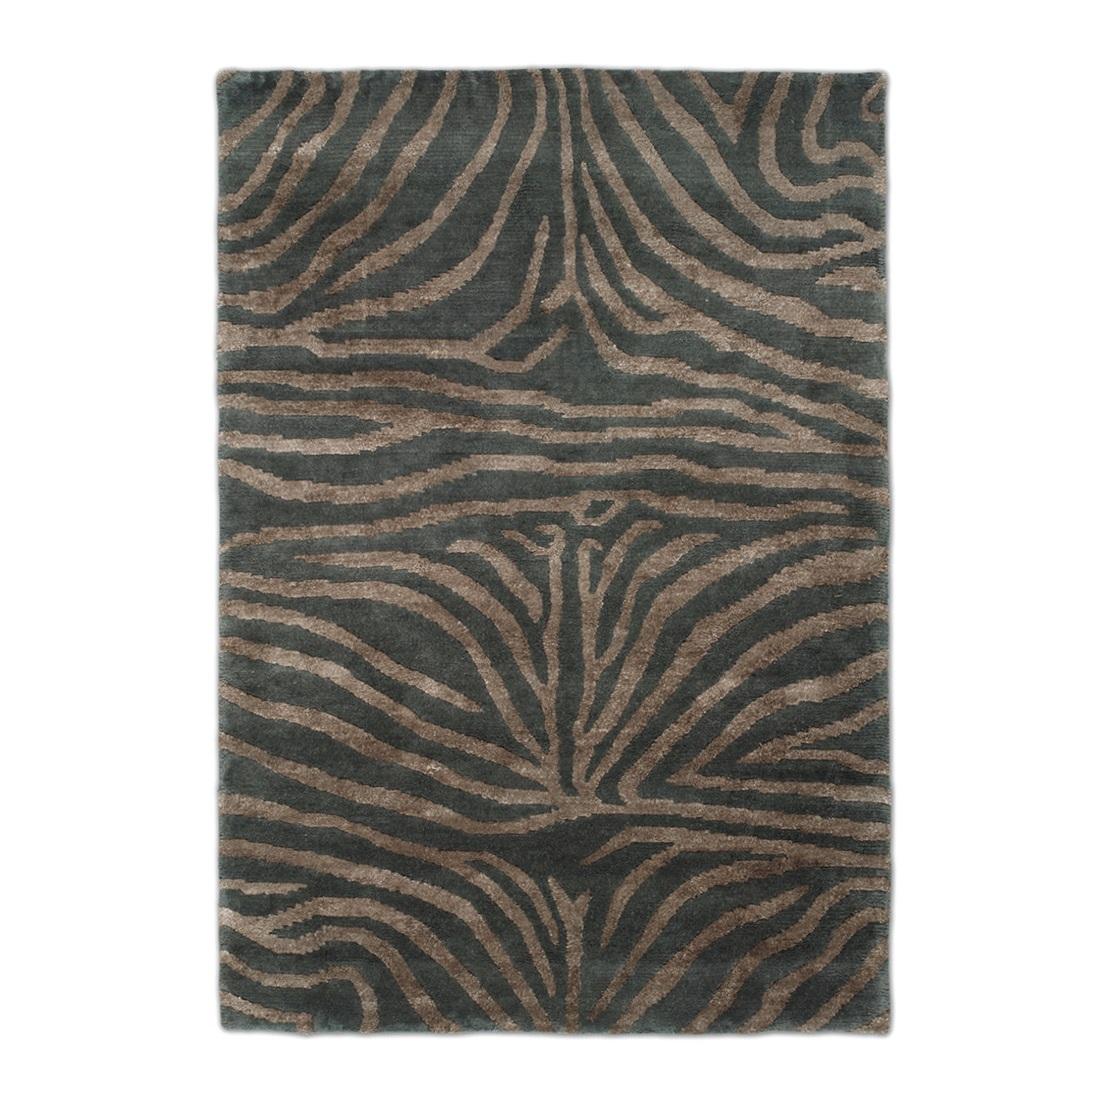 Zebramatta taupe 170 x 230 cm, Classic Collection